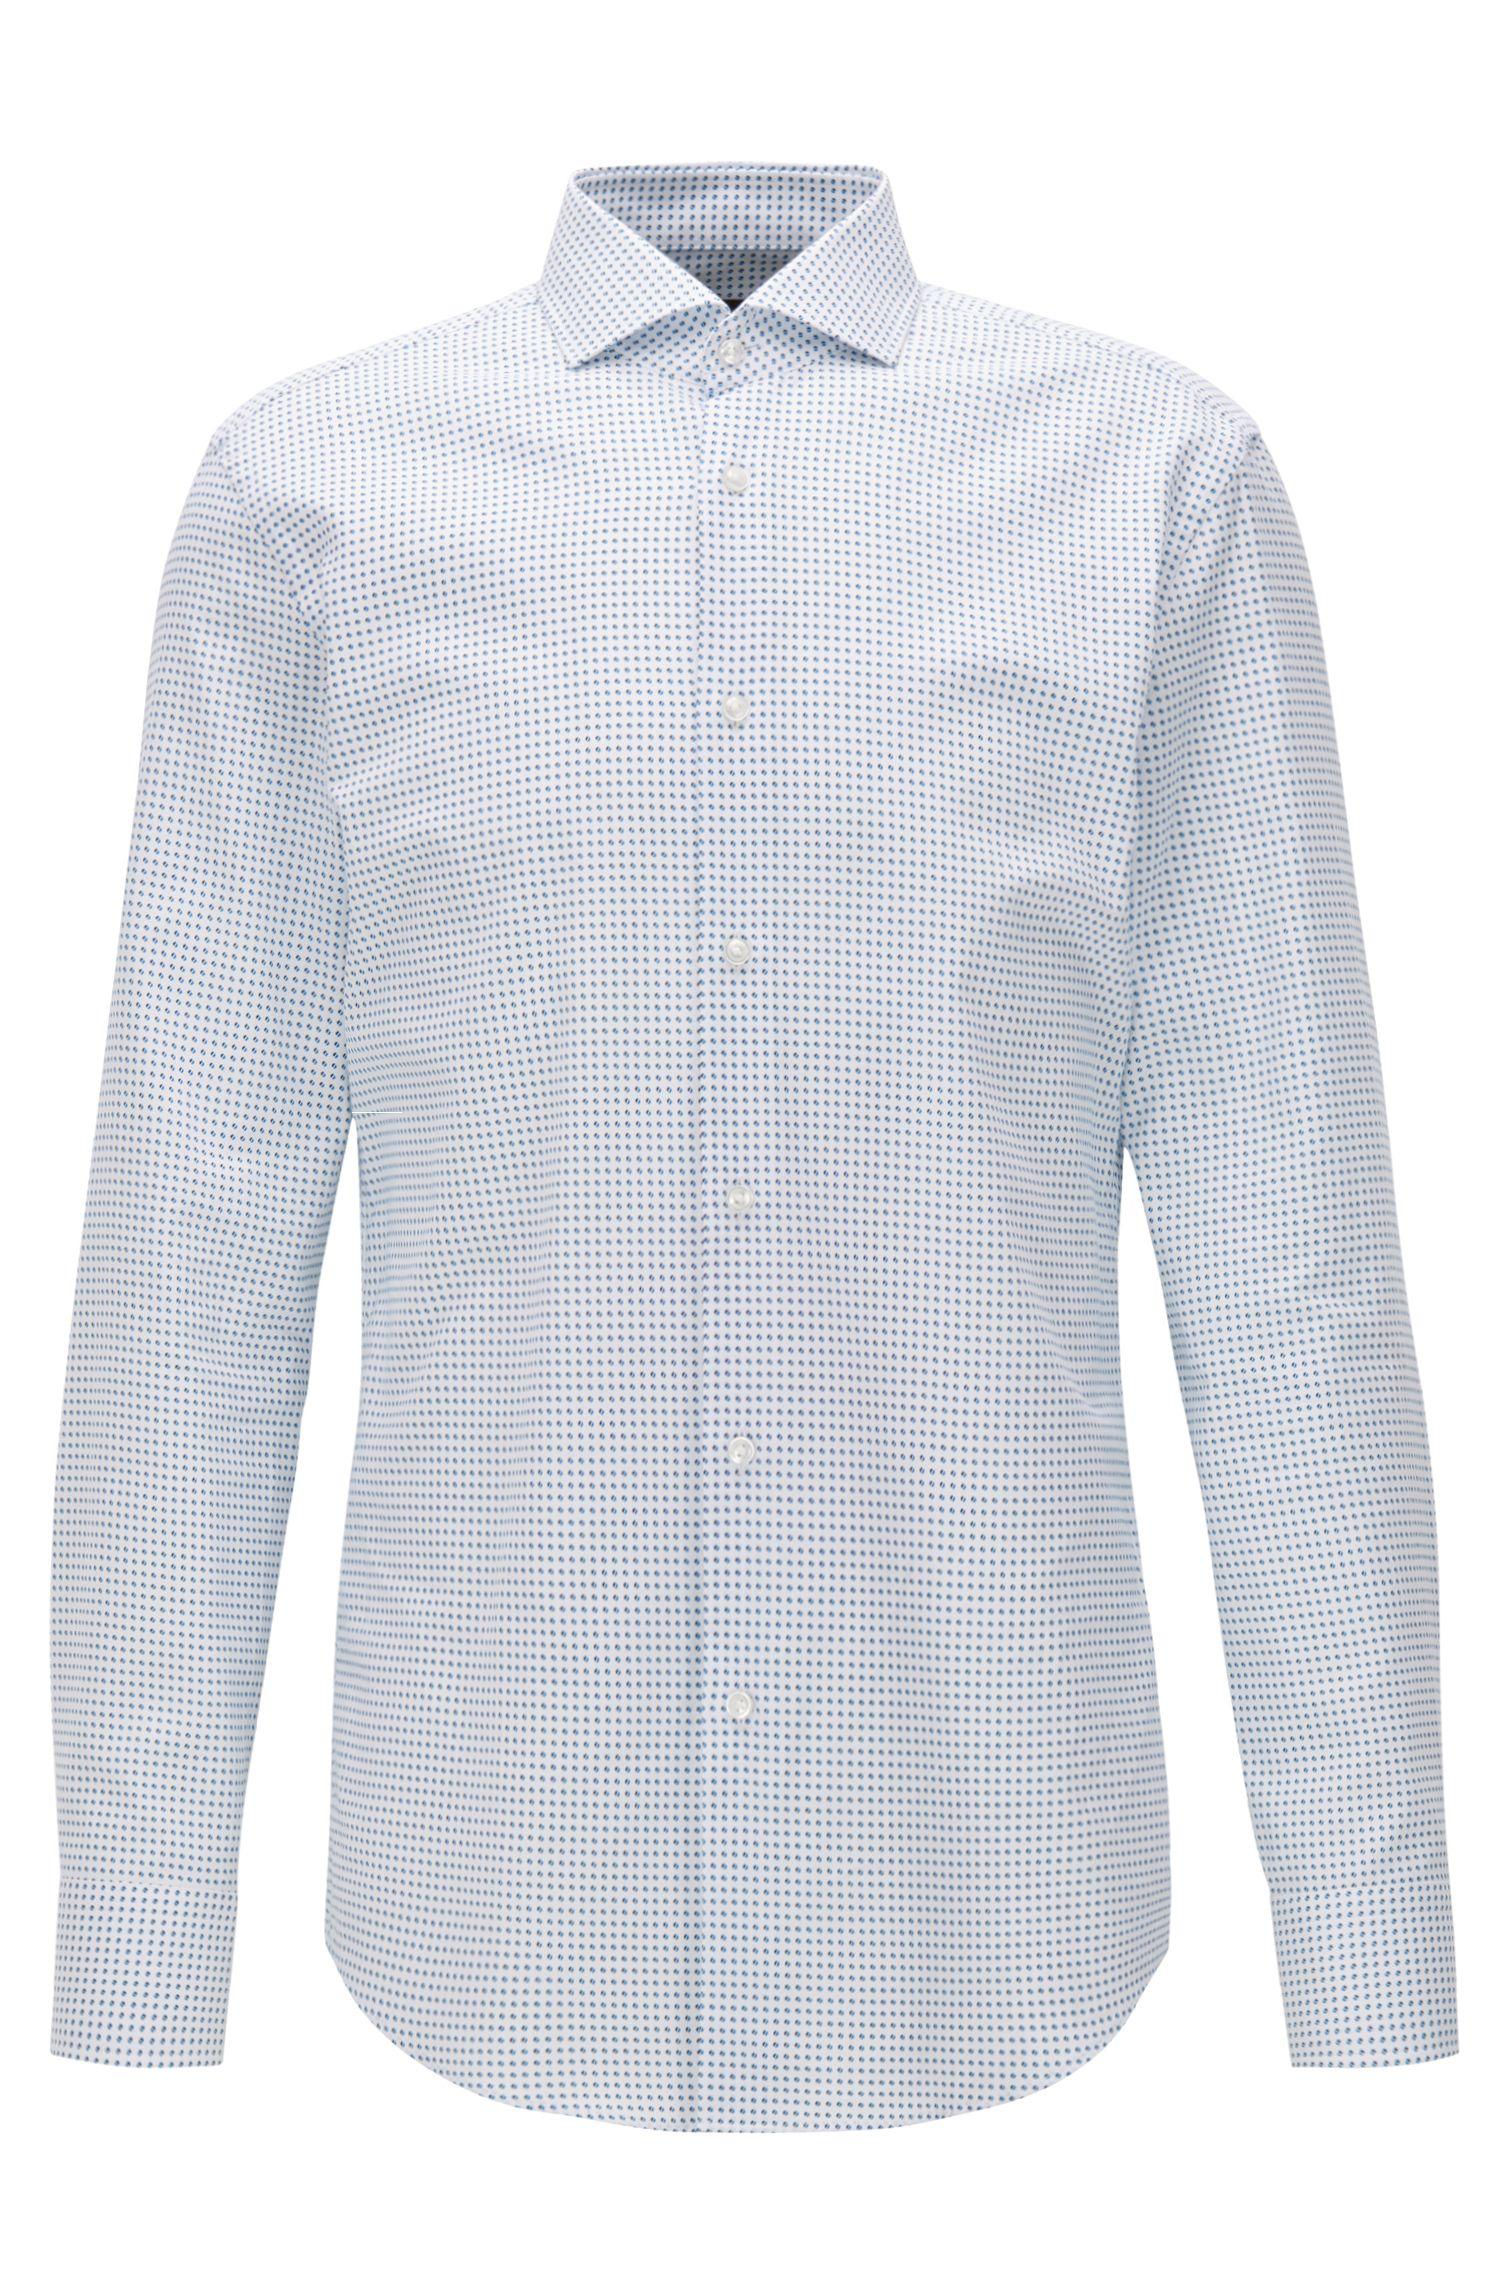 Dotted Cotton Dress Shirt, Slim Fit | Jason